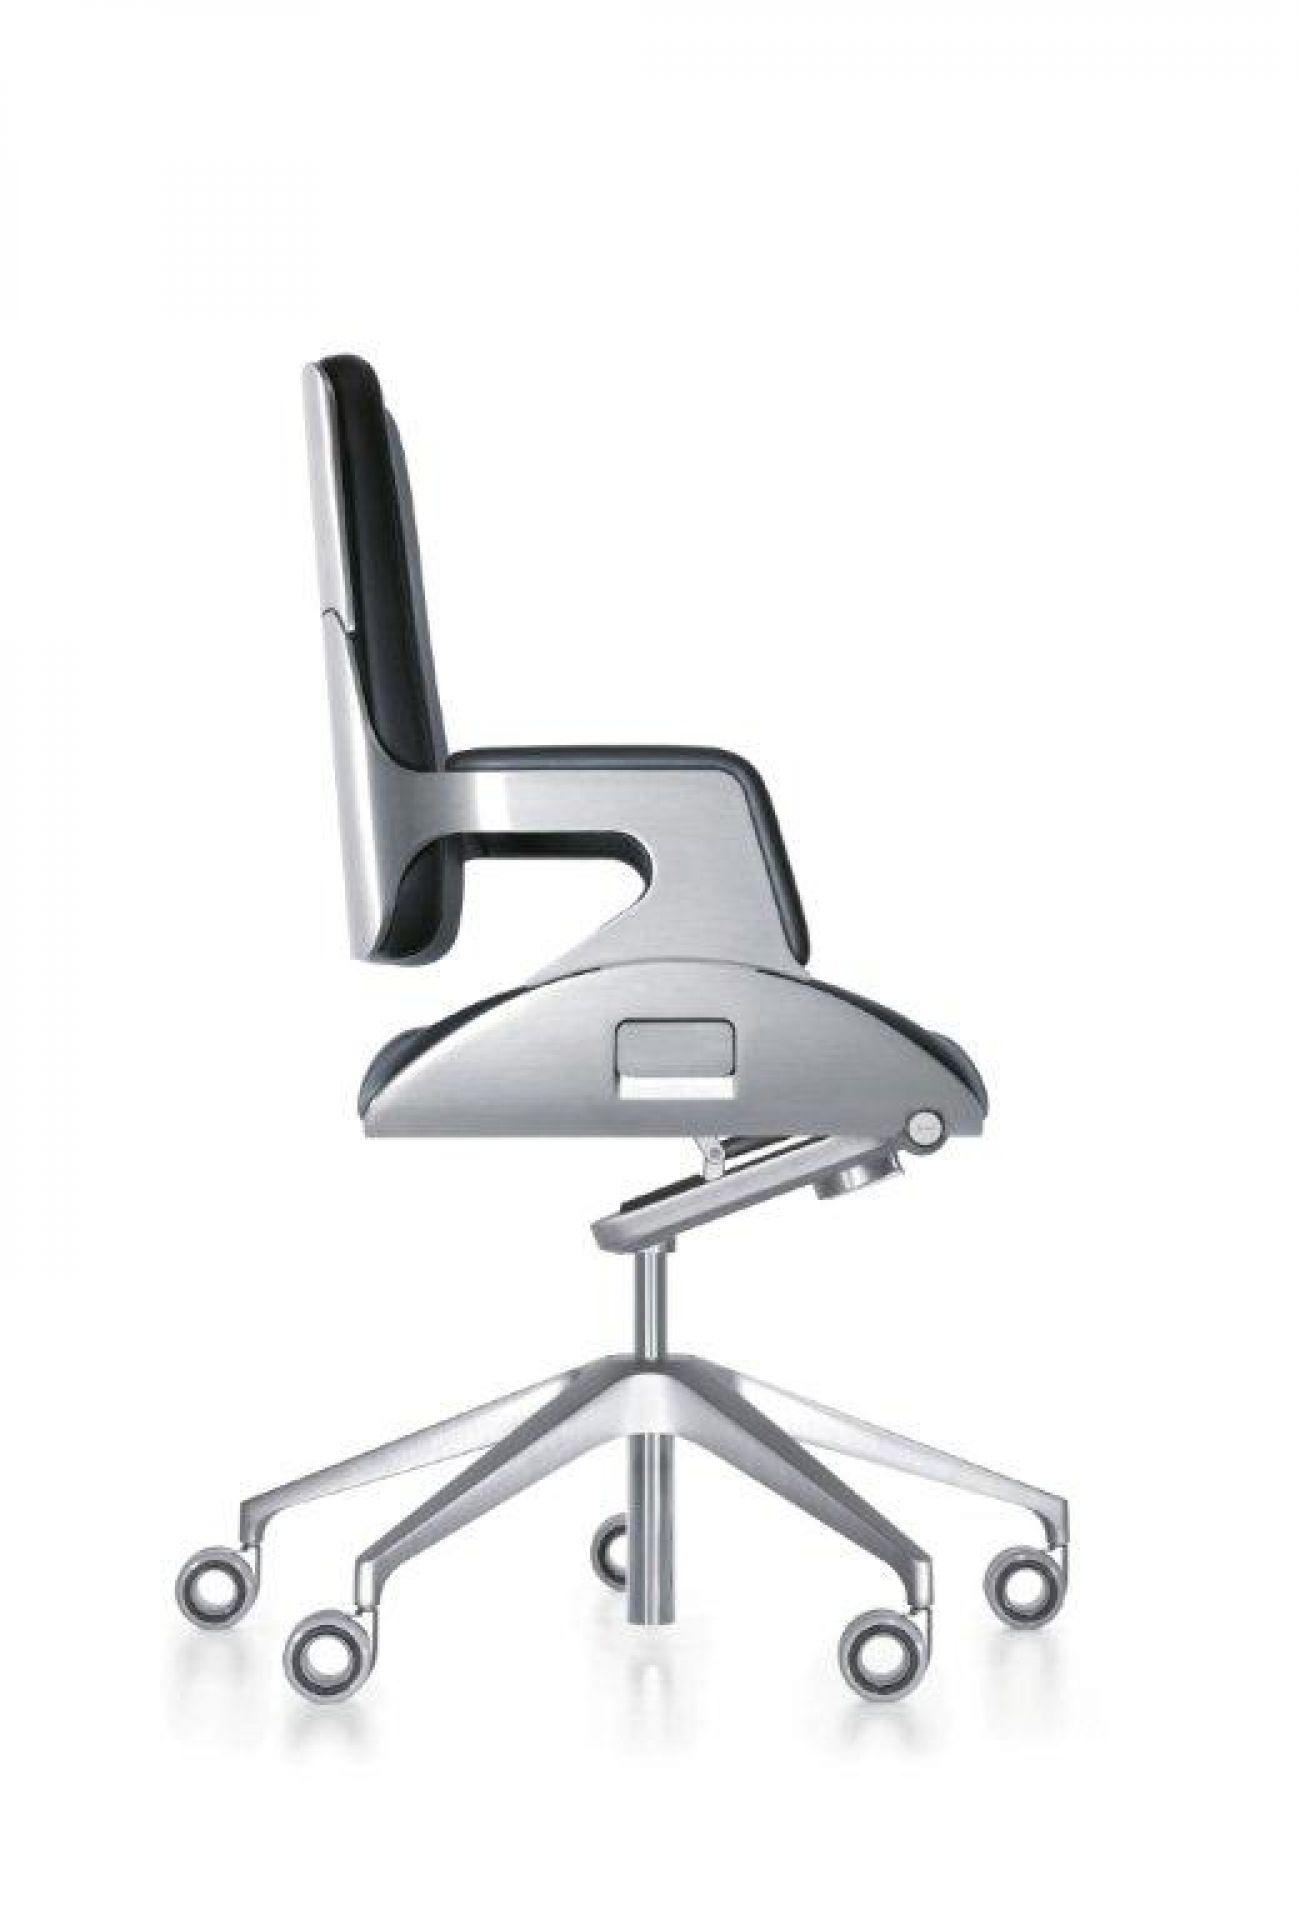 262 Silver Bürodrehstuhl Interstuhl